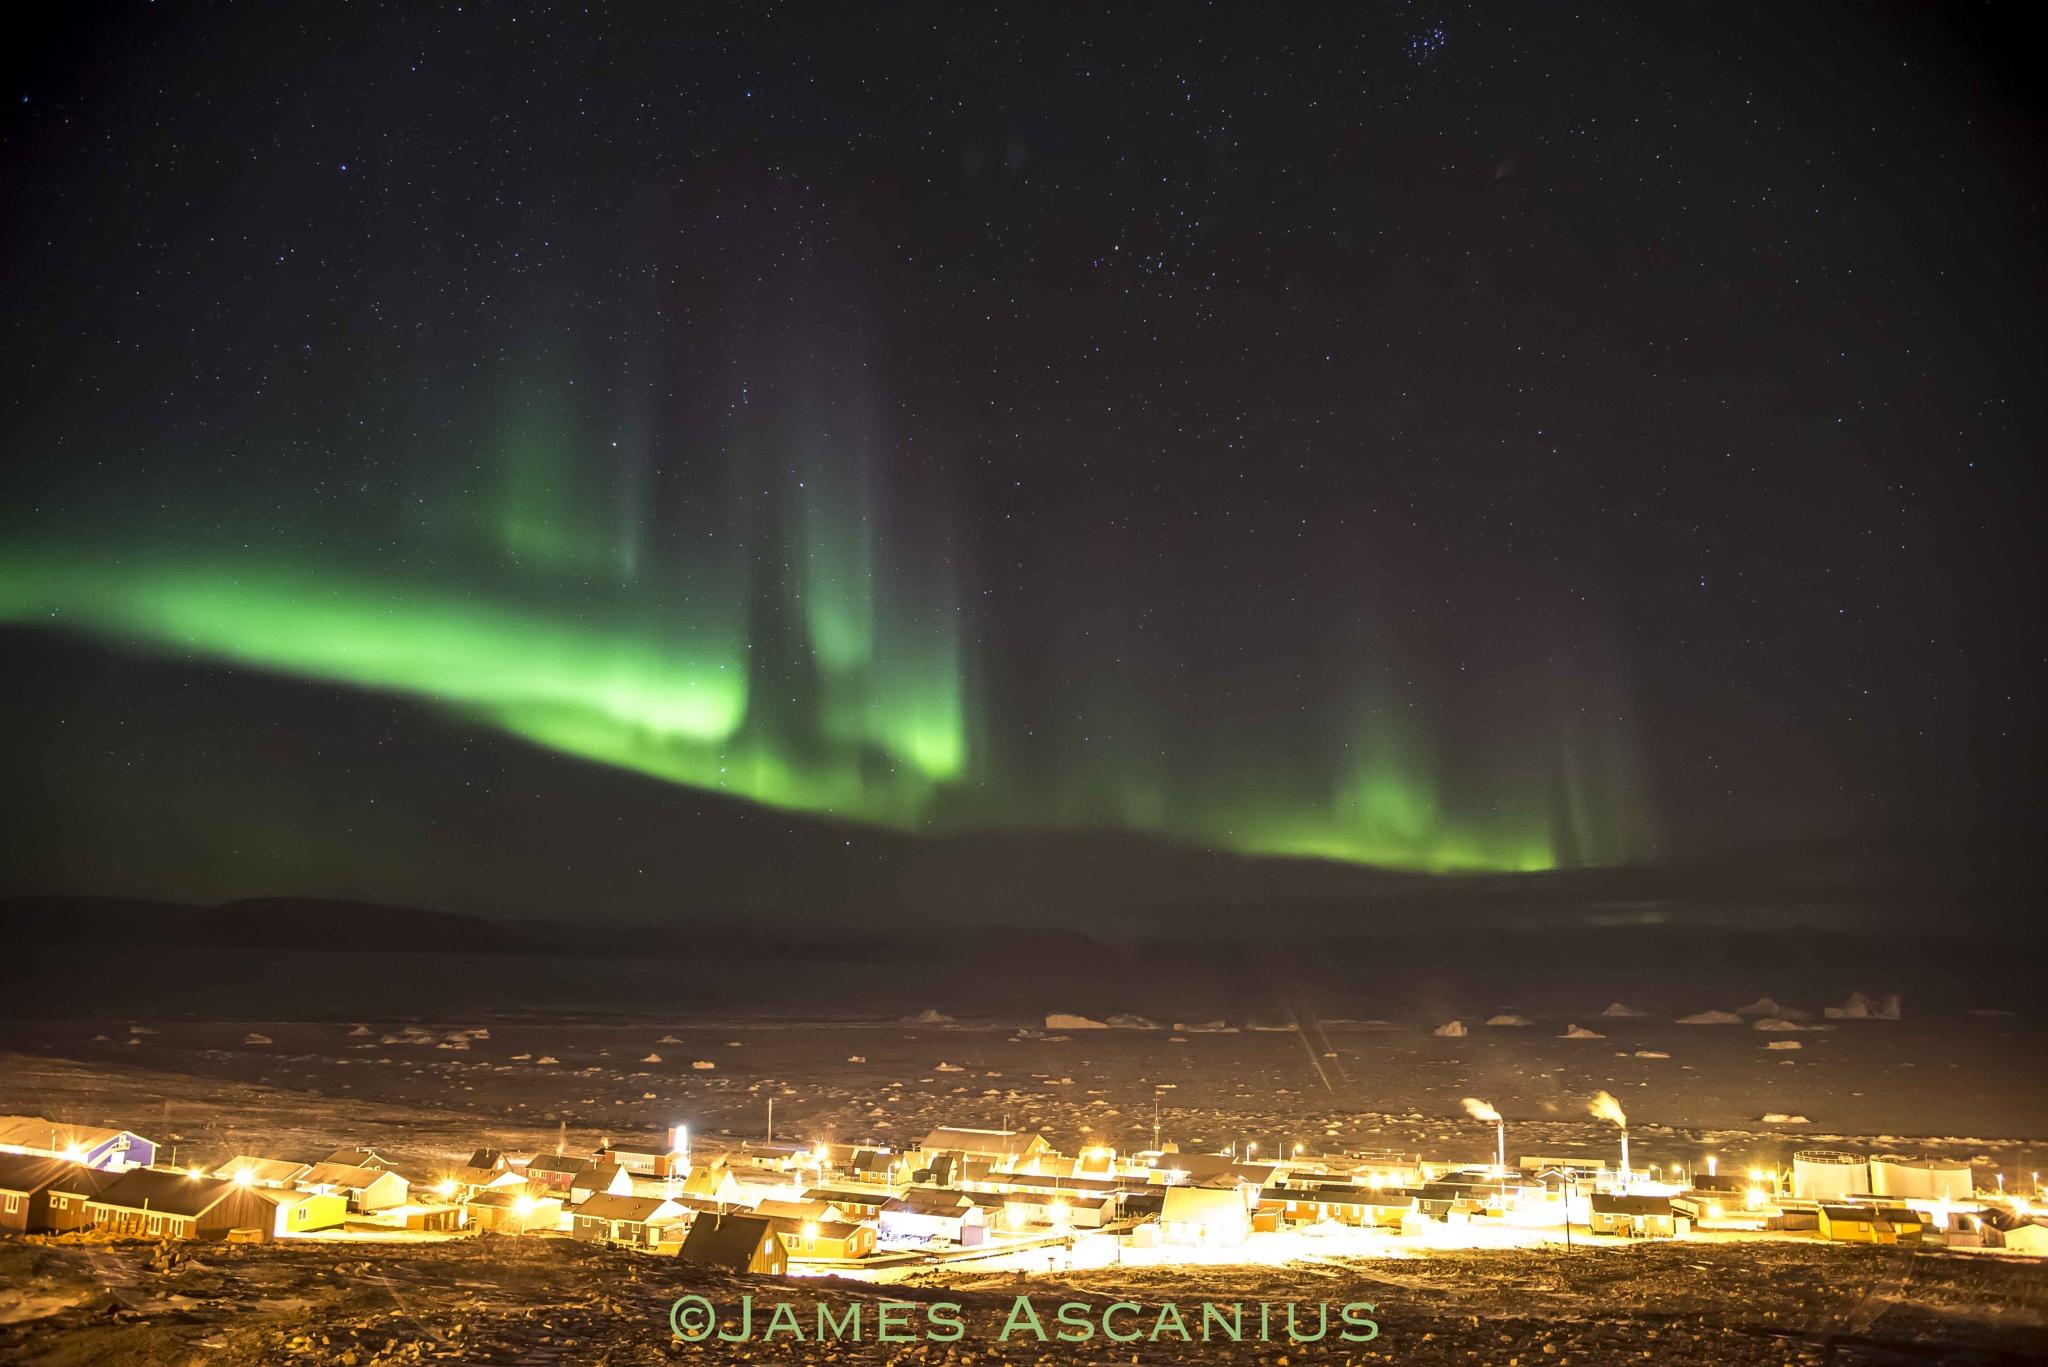 Aurora photography by James Ascanius